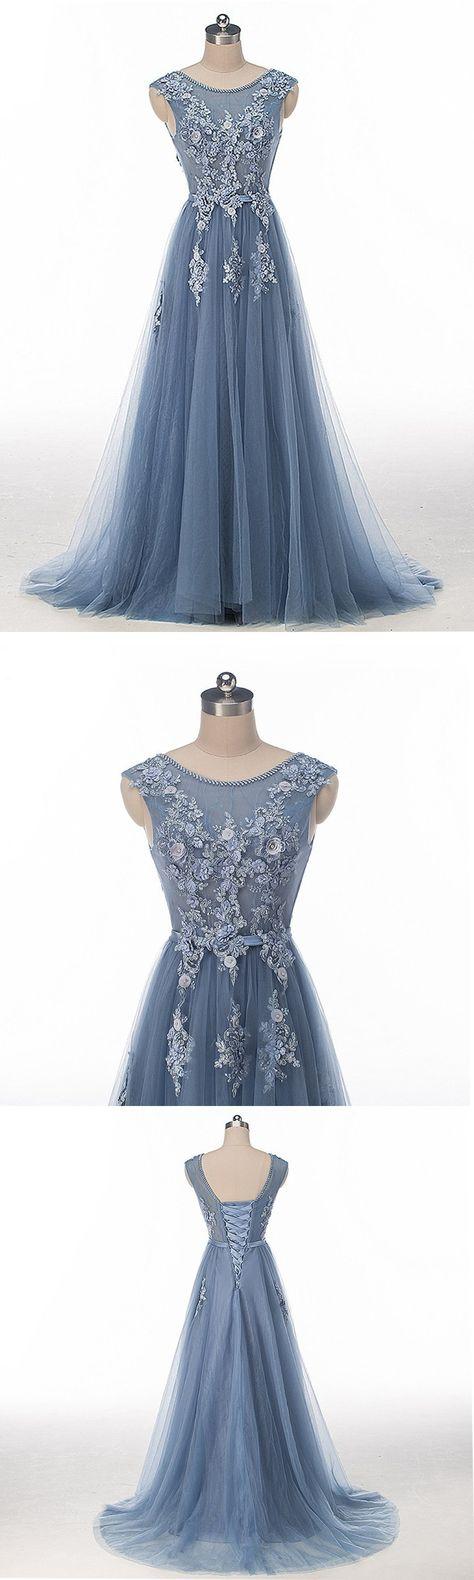 appliques Chic Prom Dresses Scoop...